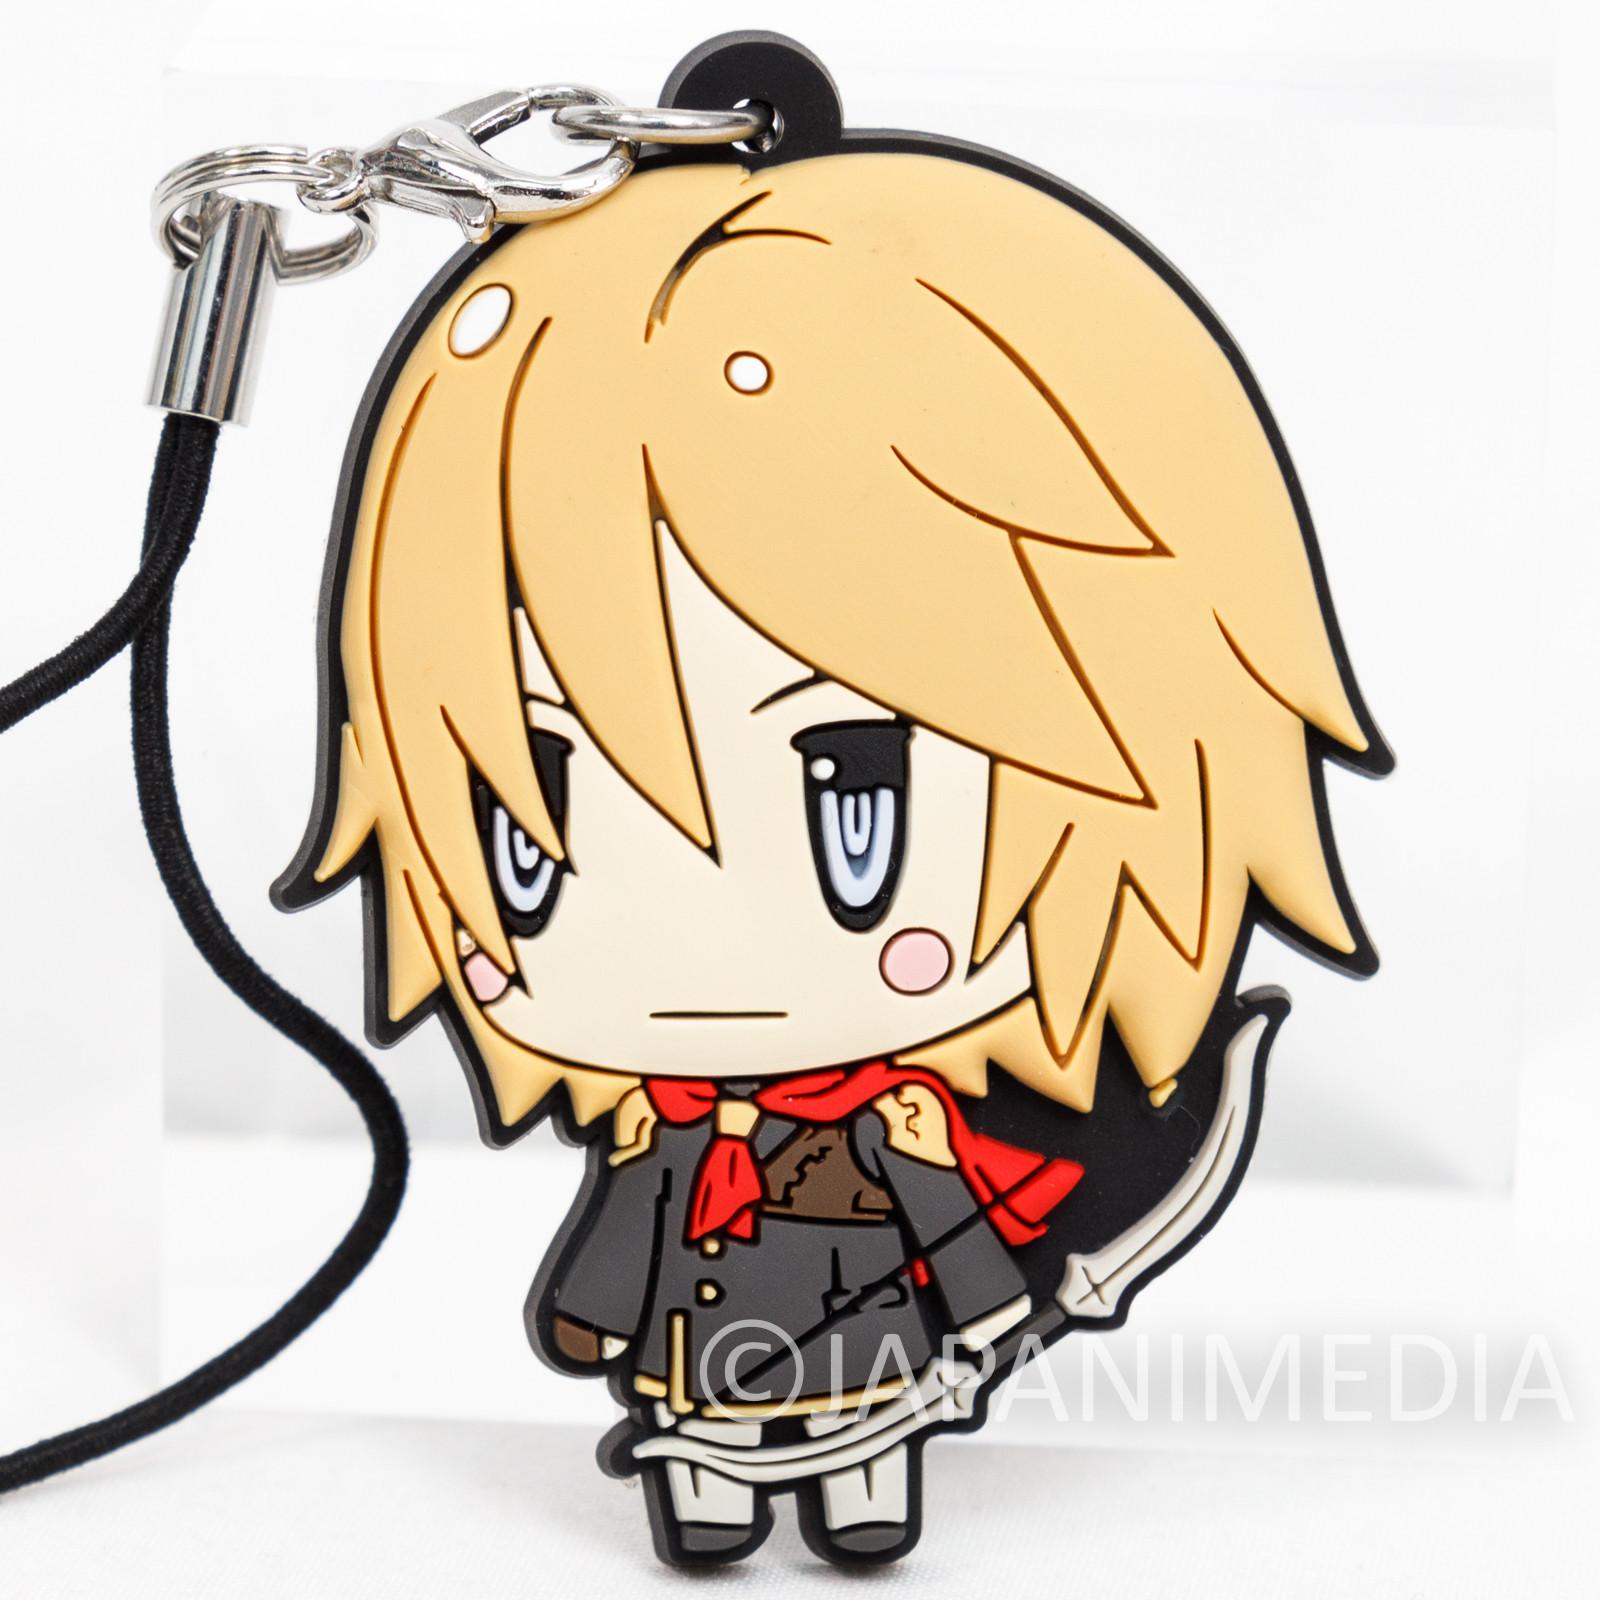 Final Fantasy Trey Mascot Rubber Strap JAPAN SQUARE ENIX